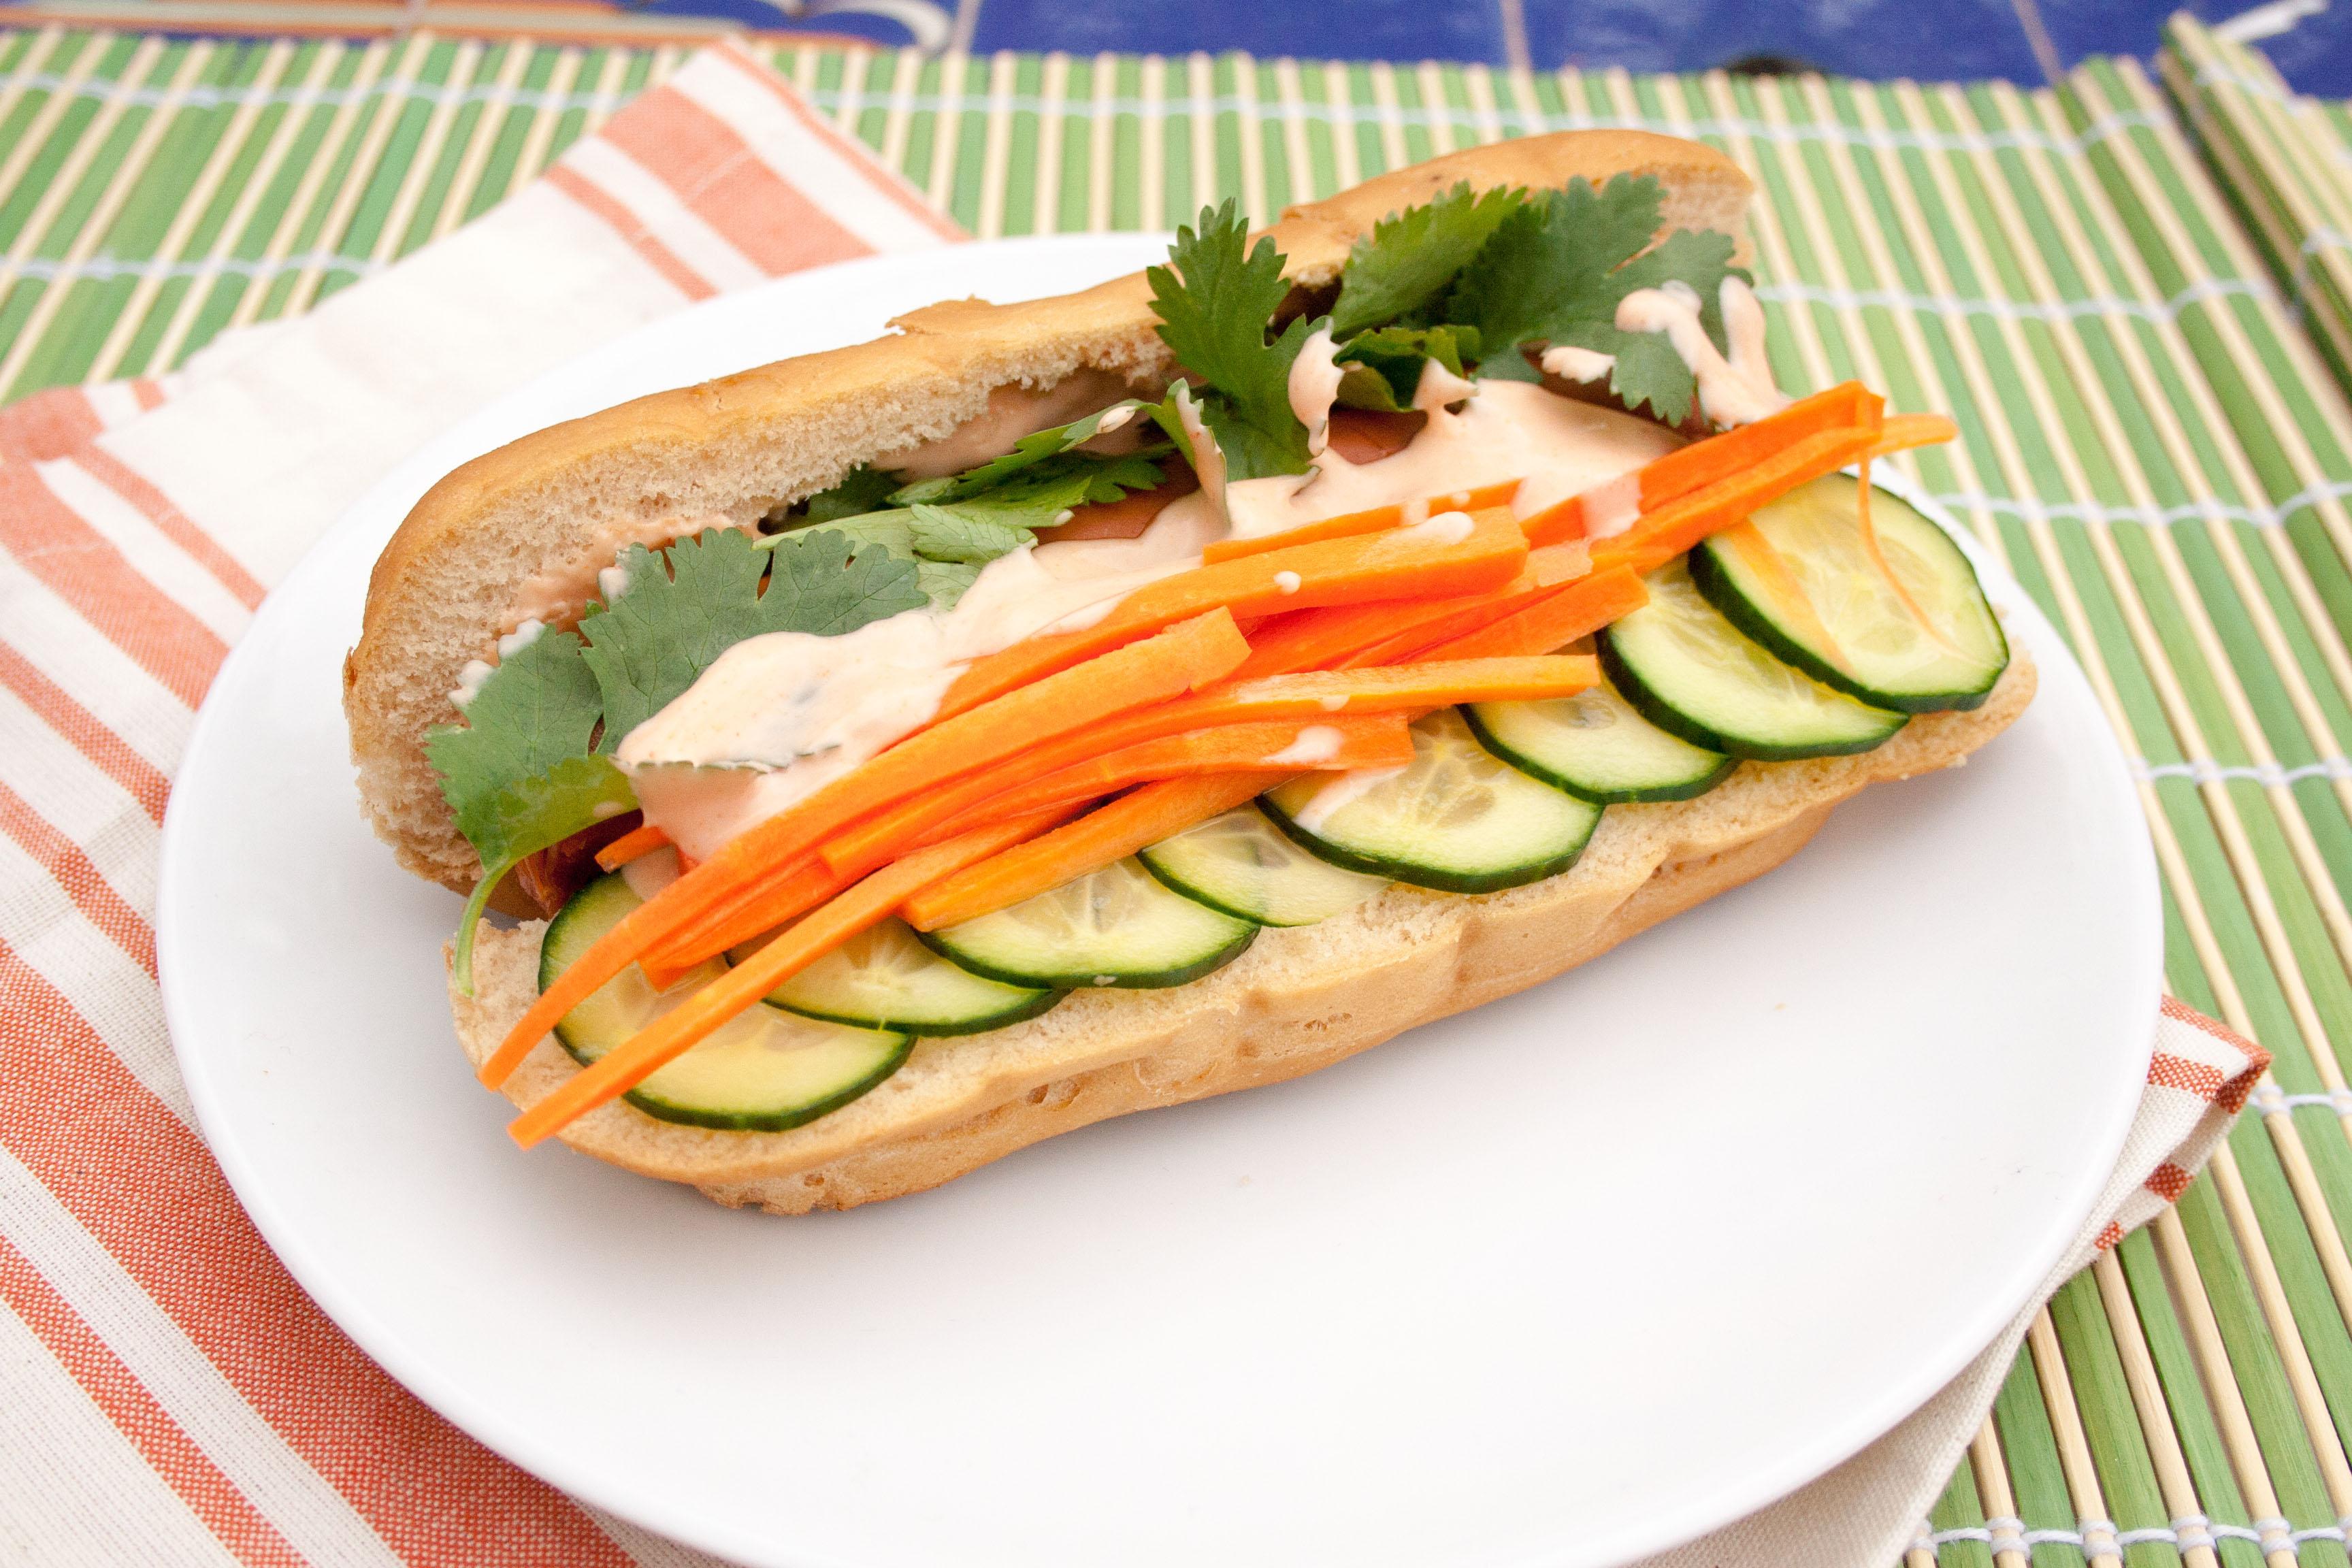 Vegan Banh Mi Hot Dog - Create Mindfully